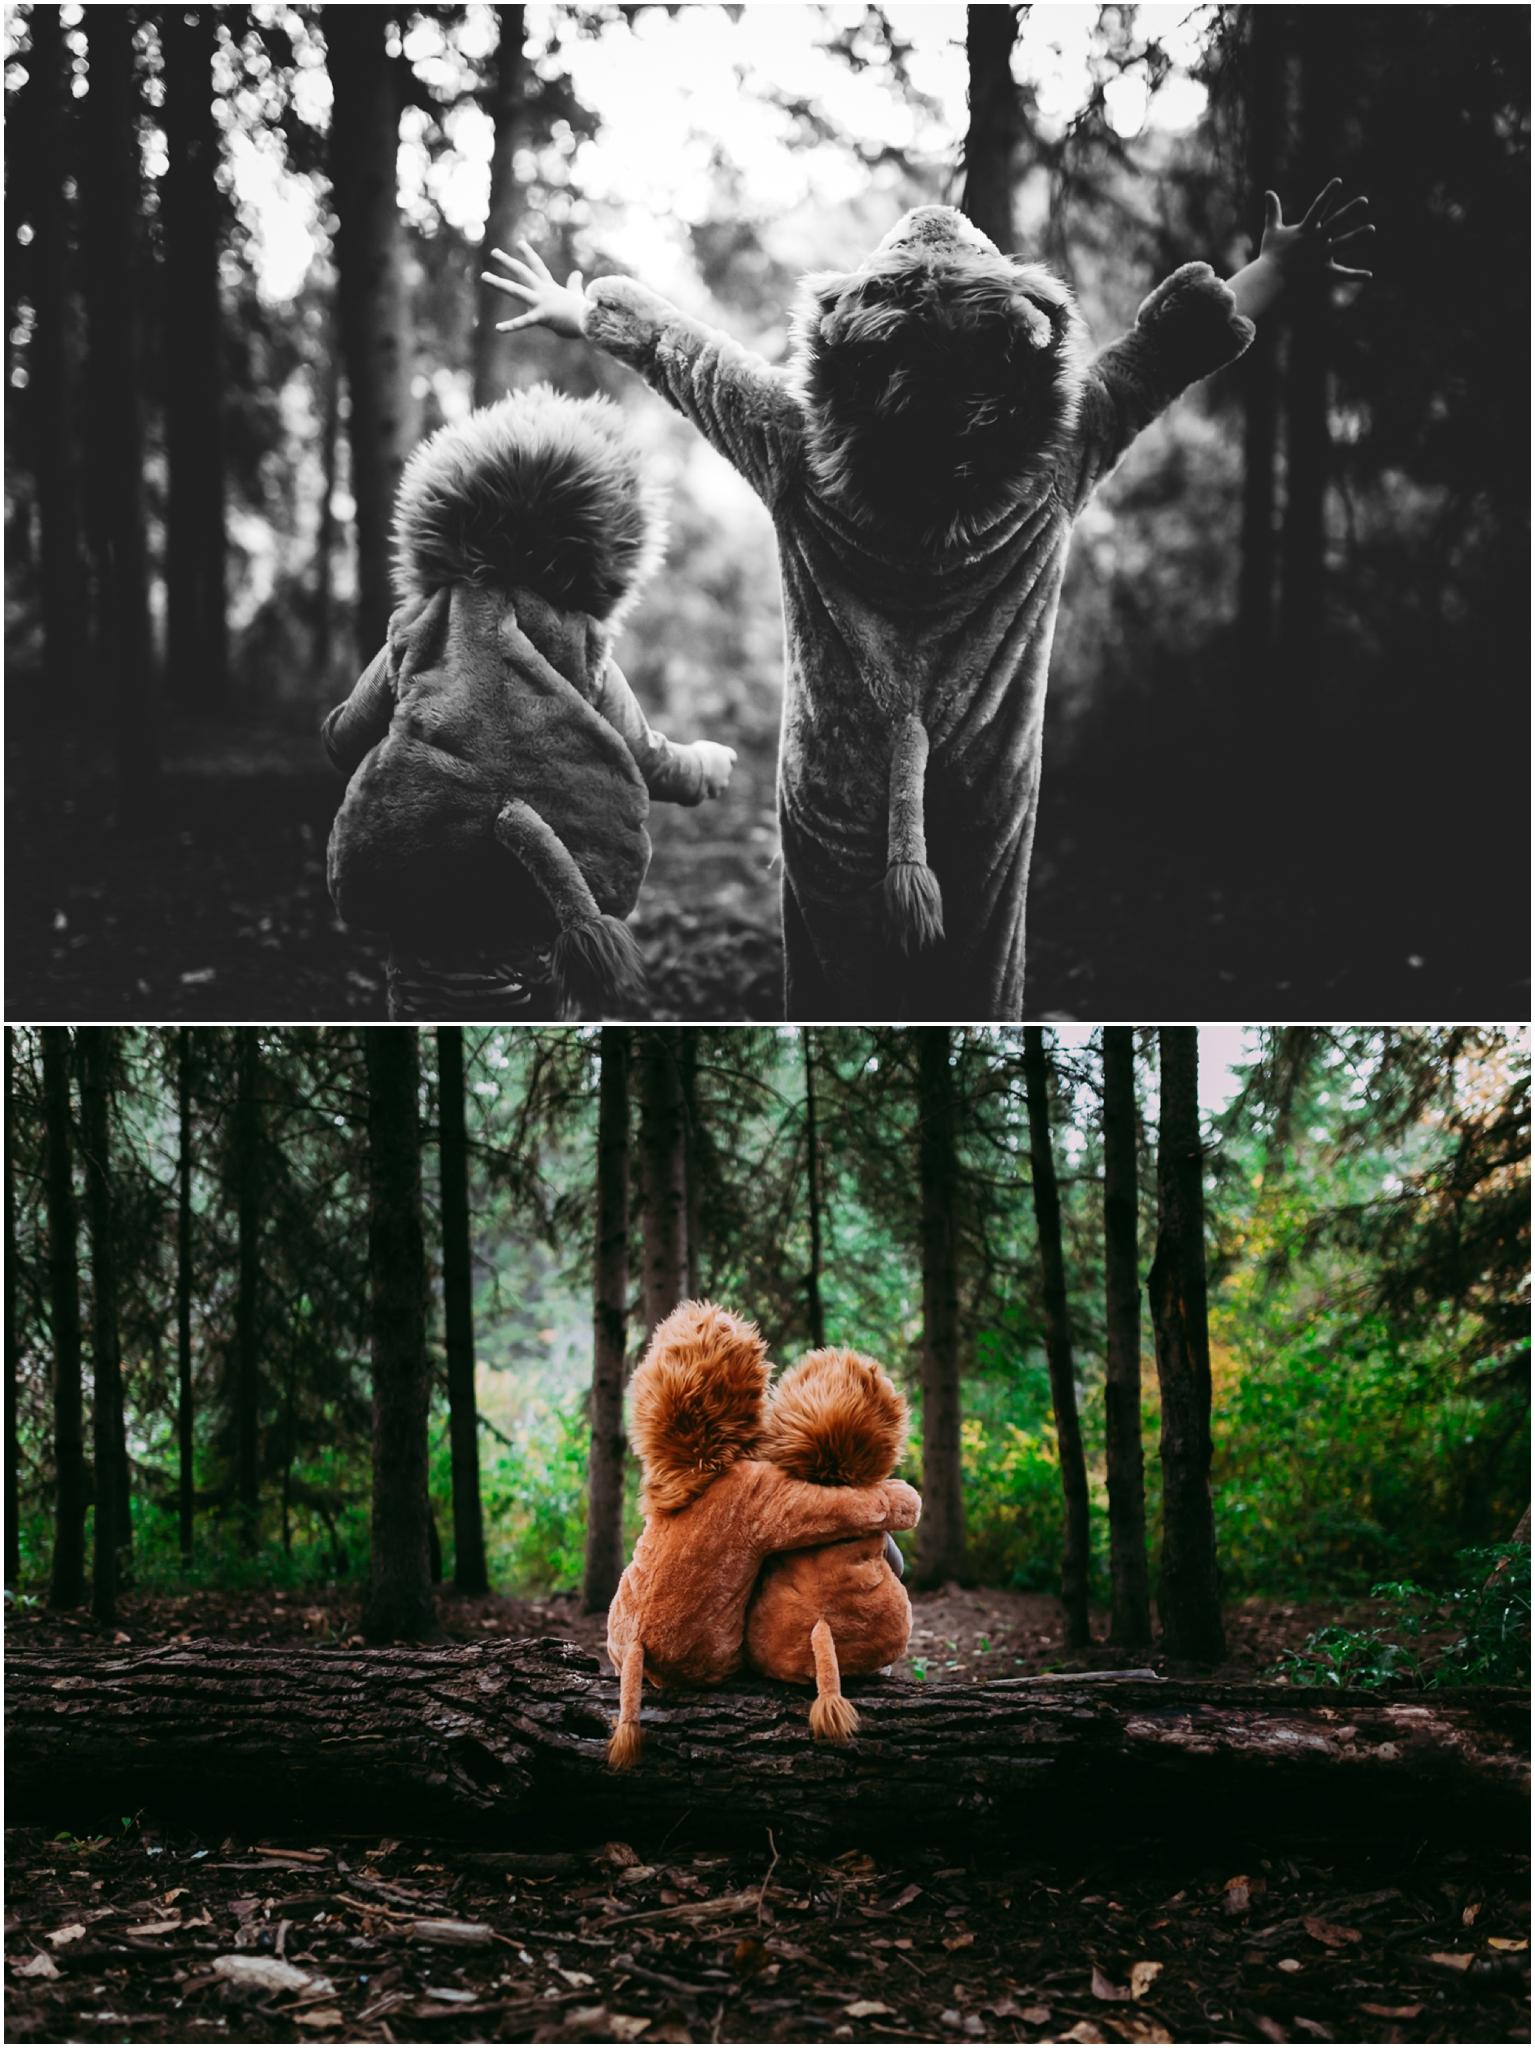 Edmonton Lifestyle Photographer - Best of 2016 - halloween costume - Where the wild things are - Lions - Lion costumes - Whitemud Ravine Park - YEG